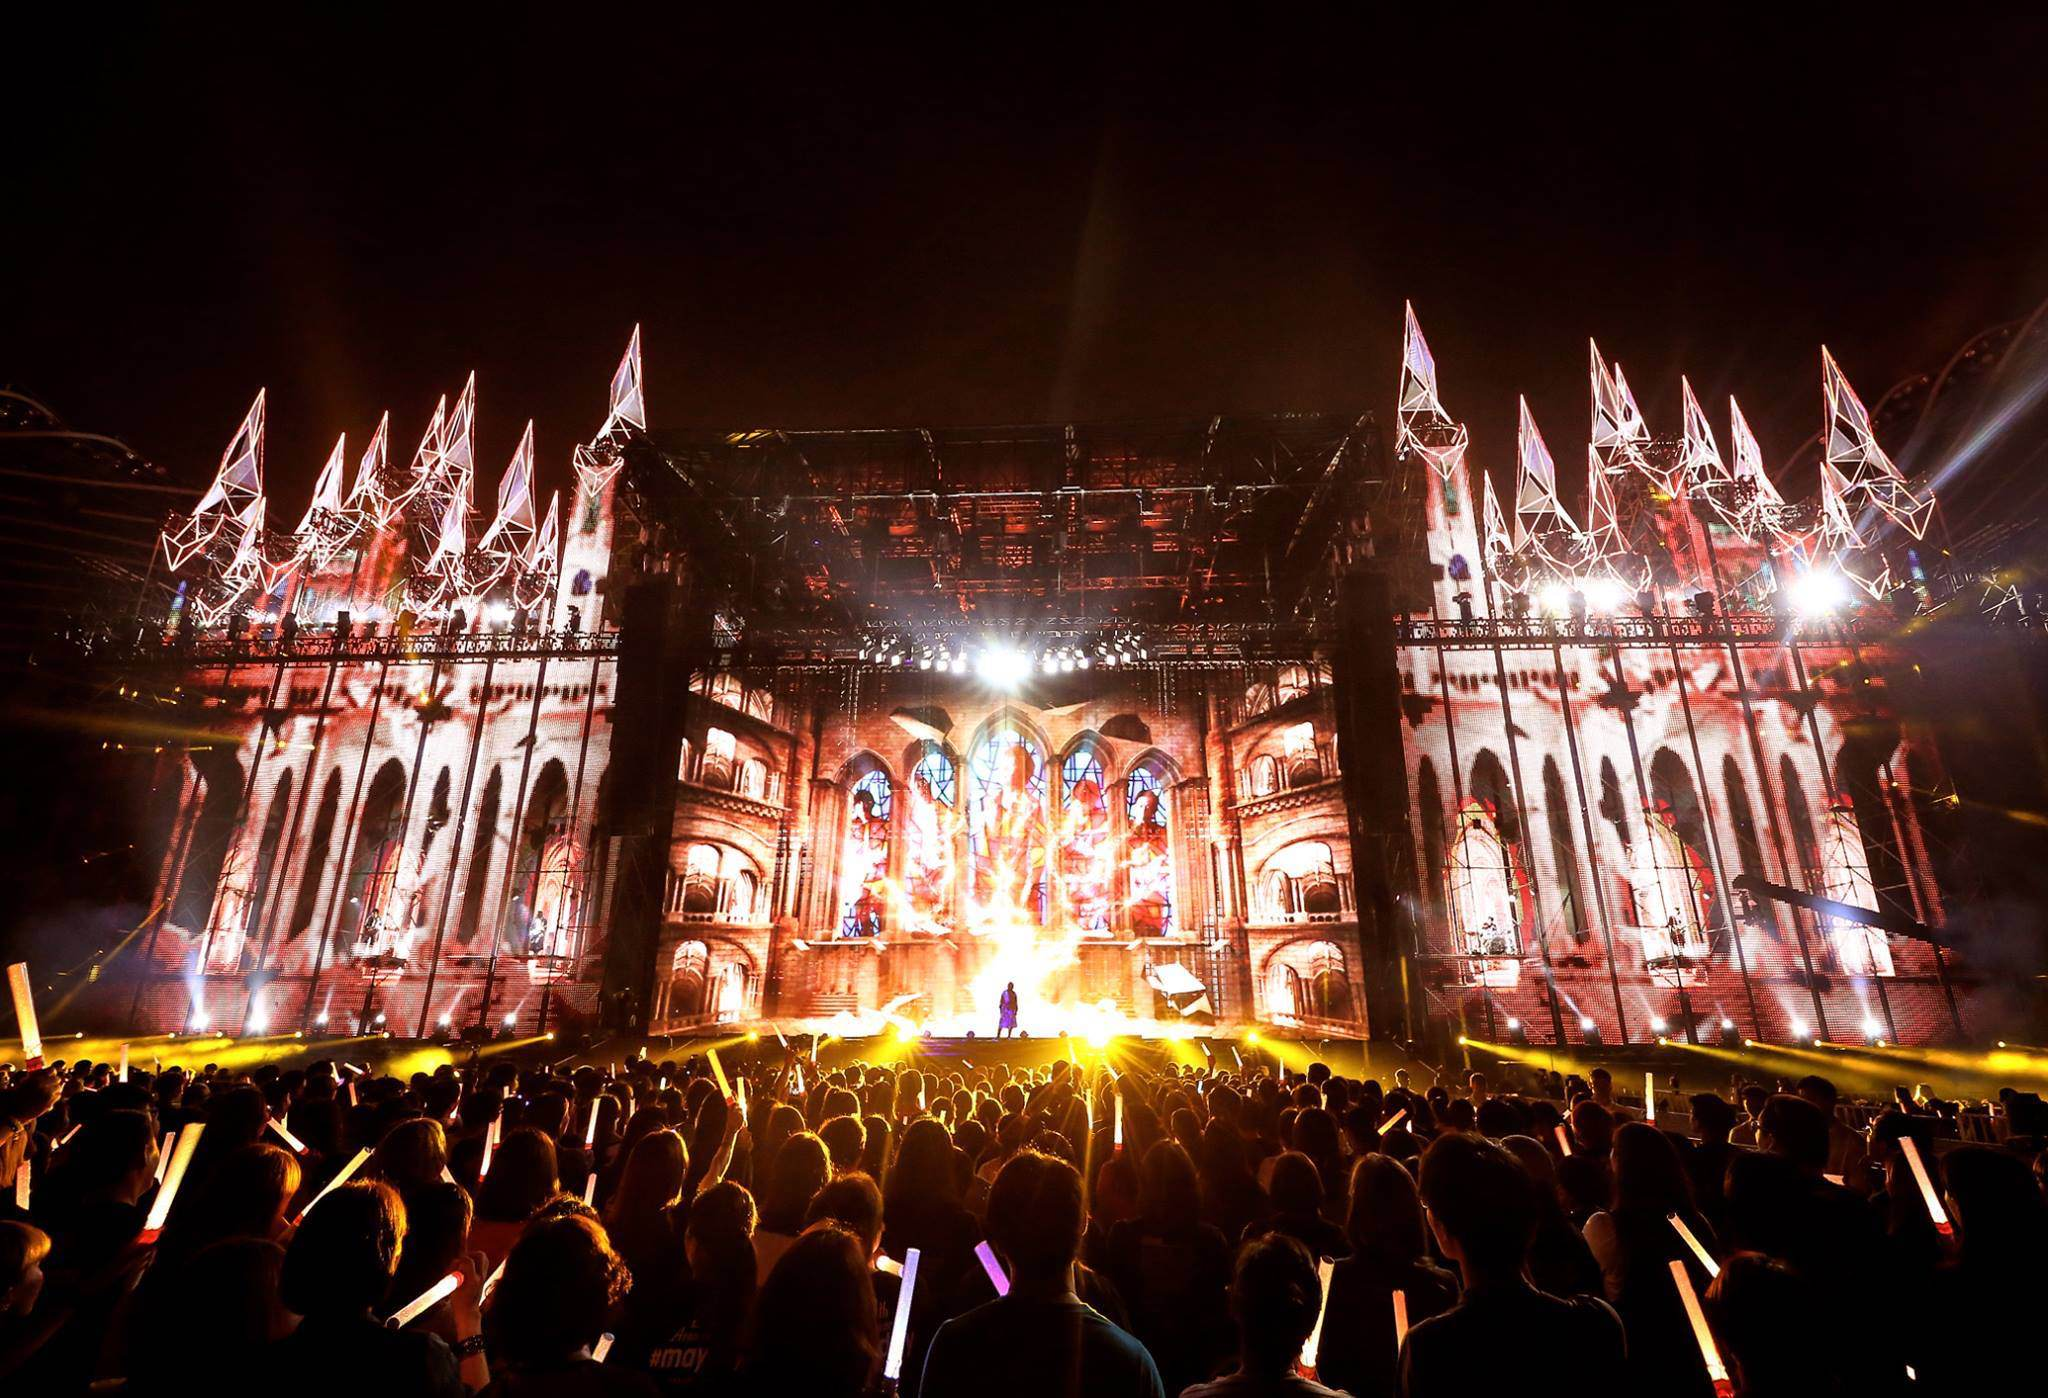 MayDay∥ 20170319 五月天《人生無限公司 2017 LIFE TOUR》演唱會心得/歌單曲目 – 你的自傳有無限多種寫法